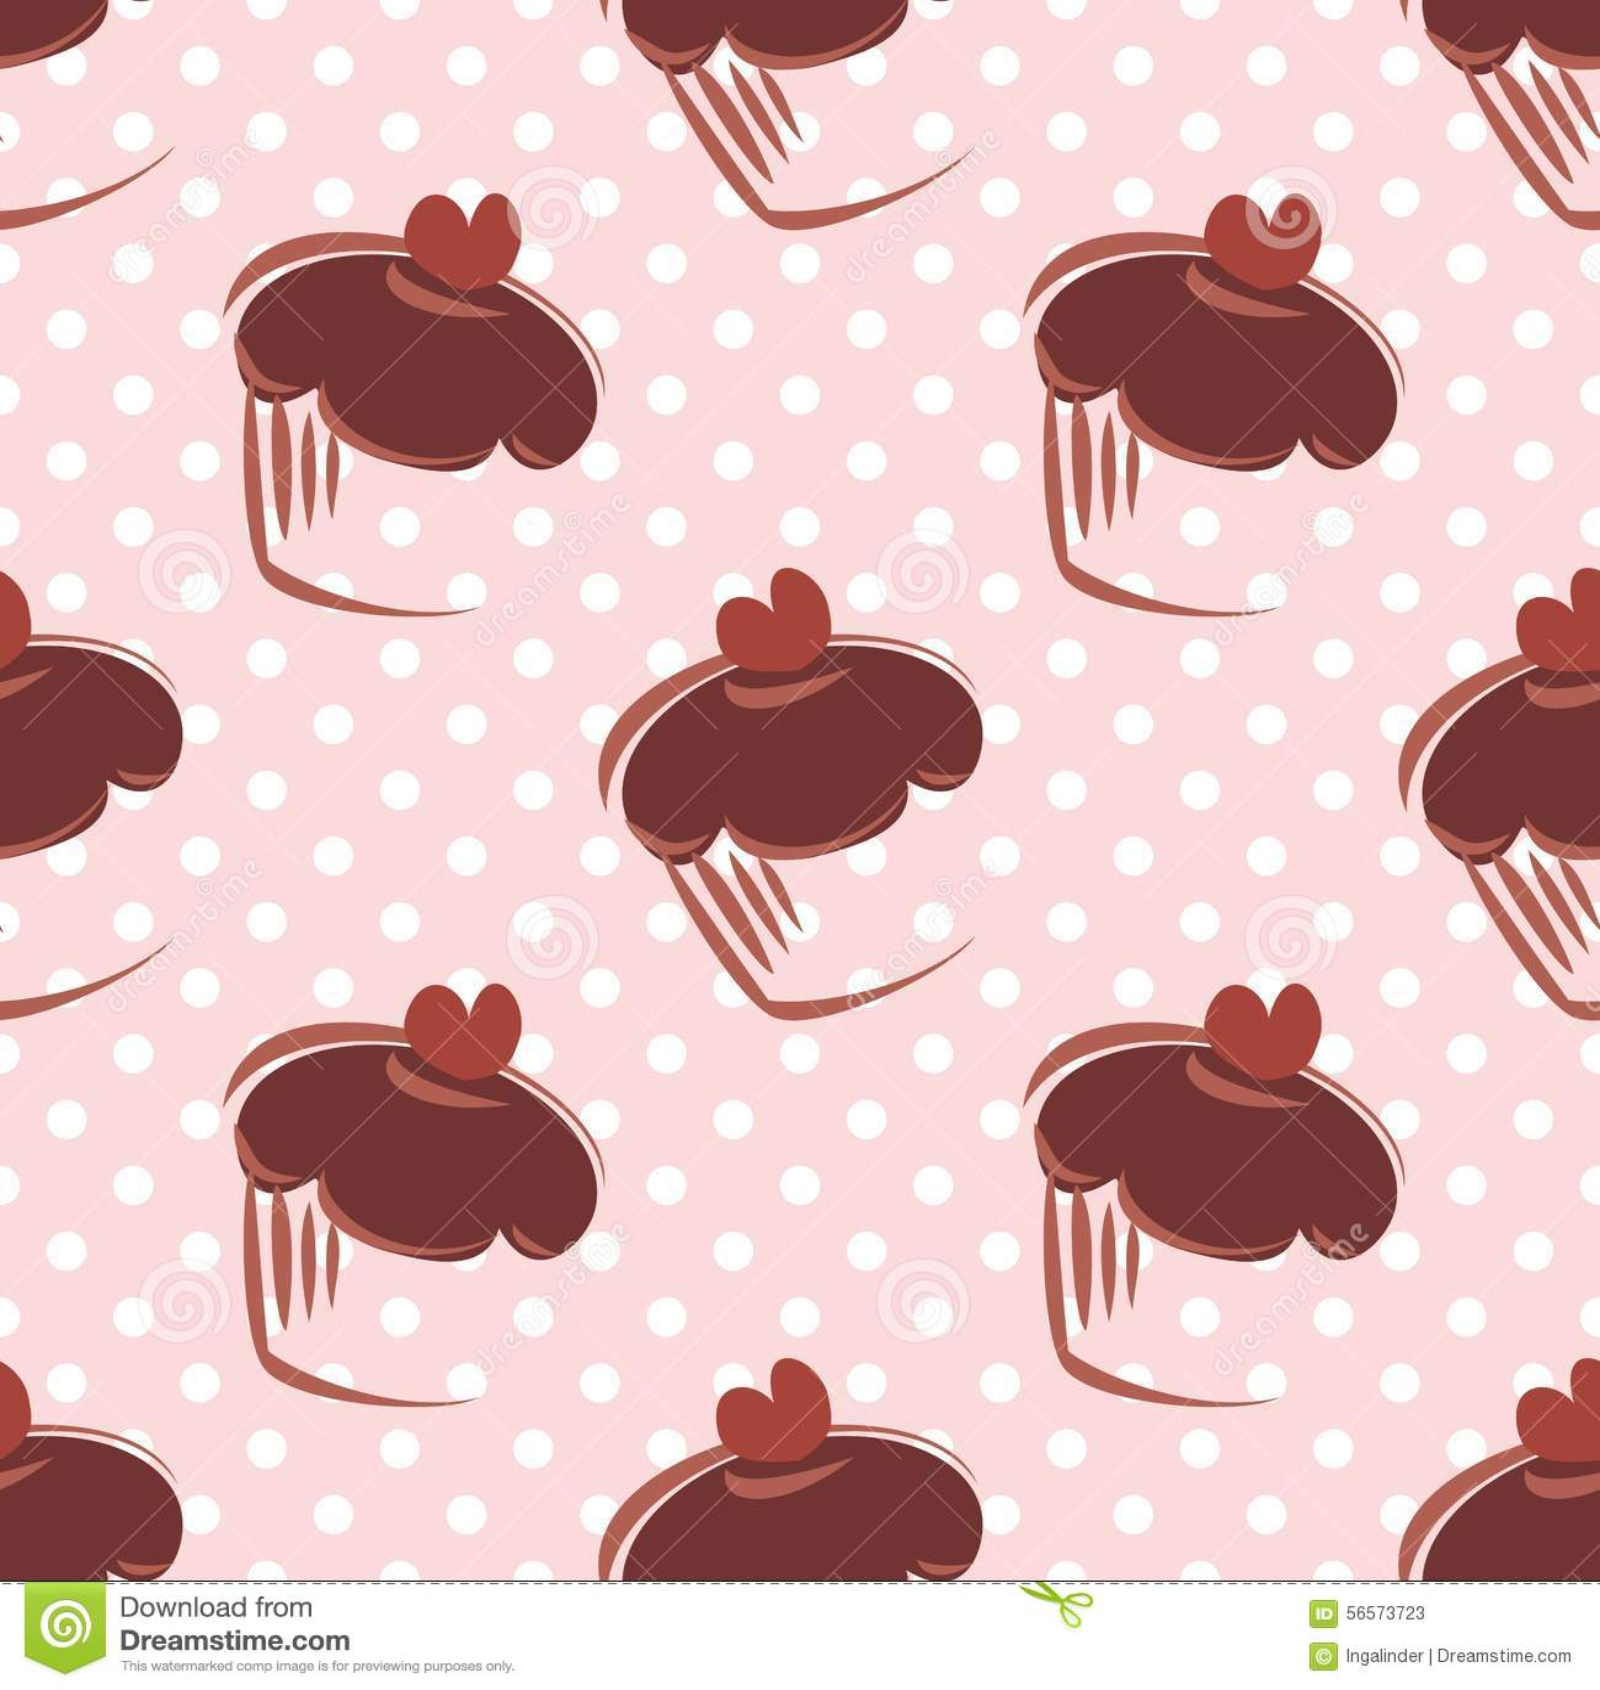 Download Διανυσματικό σχέδιο κεραμιδιών με τα Cupcakes και τα σημεία Πόλκα στο ρόδινο υπόβαθρο Διανυσματική απεικόνιση - εικονογραφία από party, doodle: 56573723